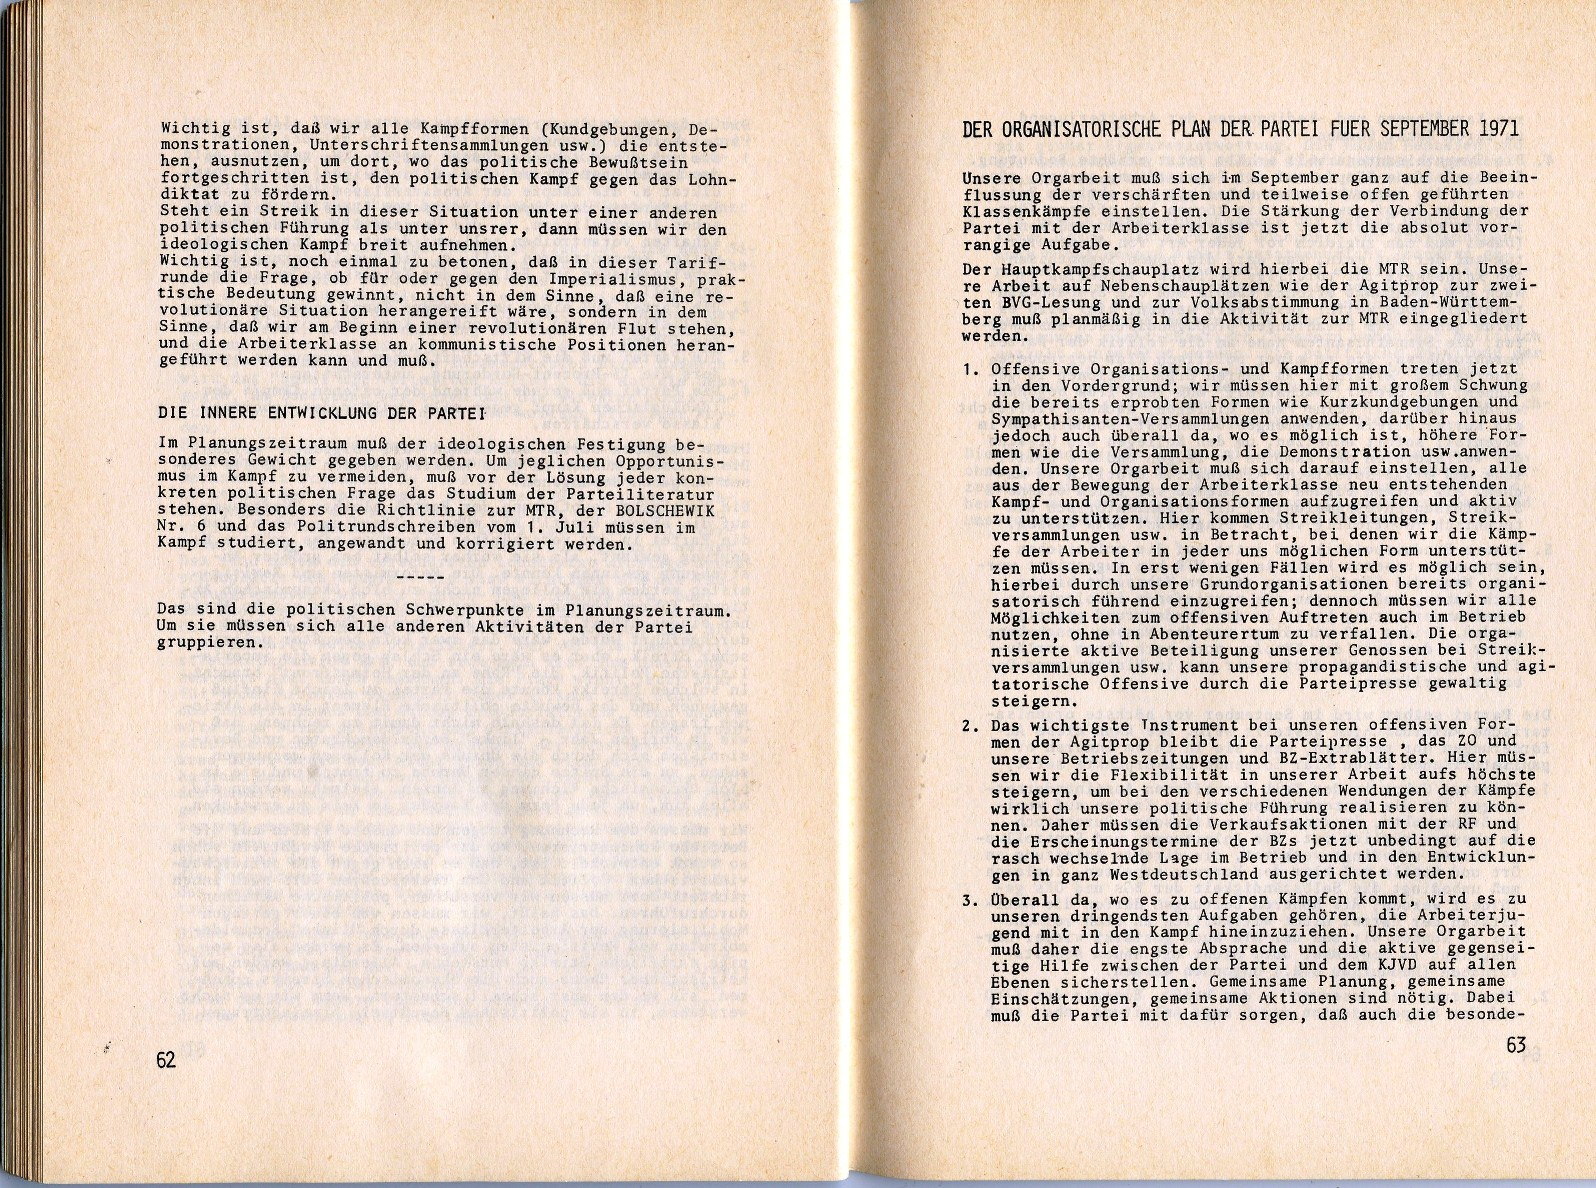 ZB_Parteiarbeiter_1971_07_33